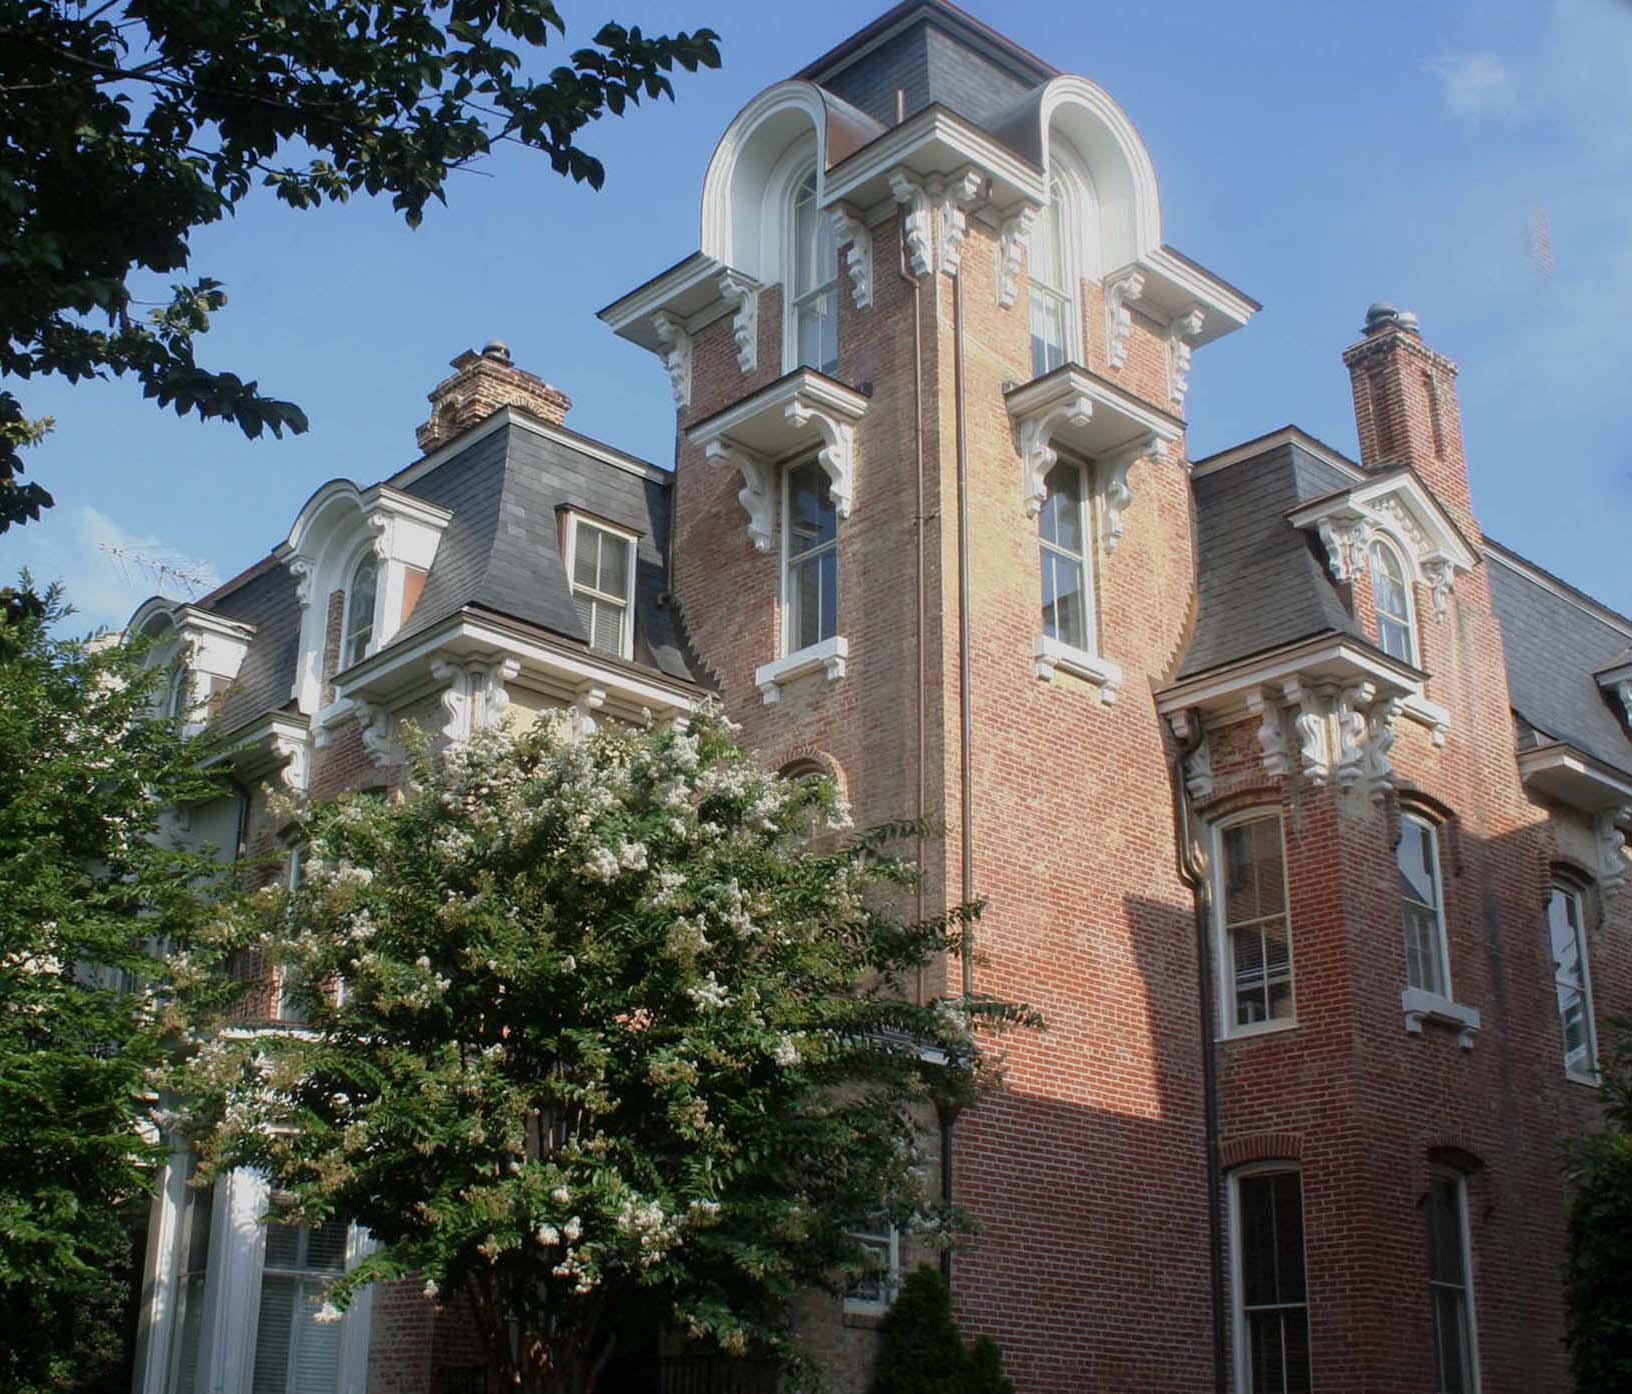 Dom w Washington, D.C., United States